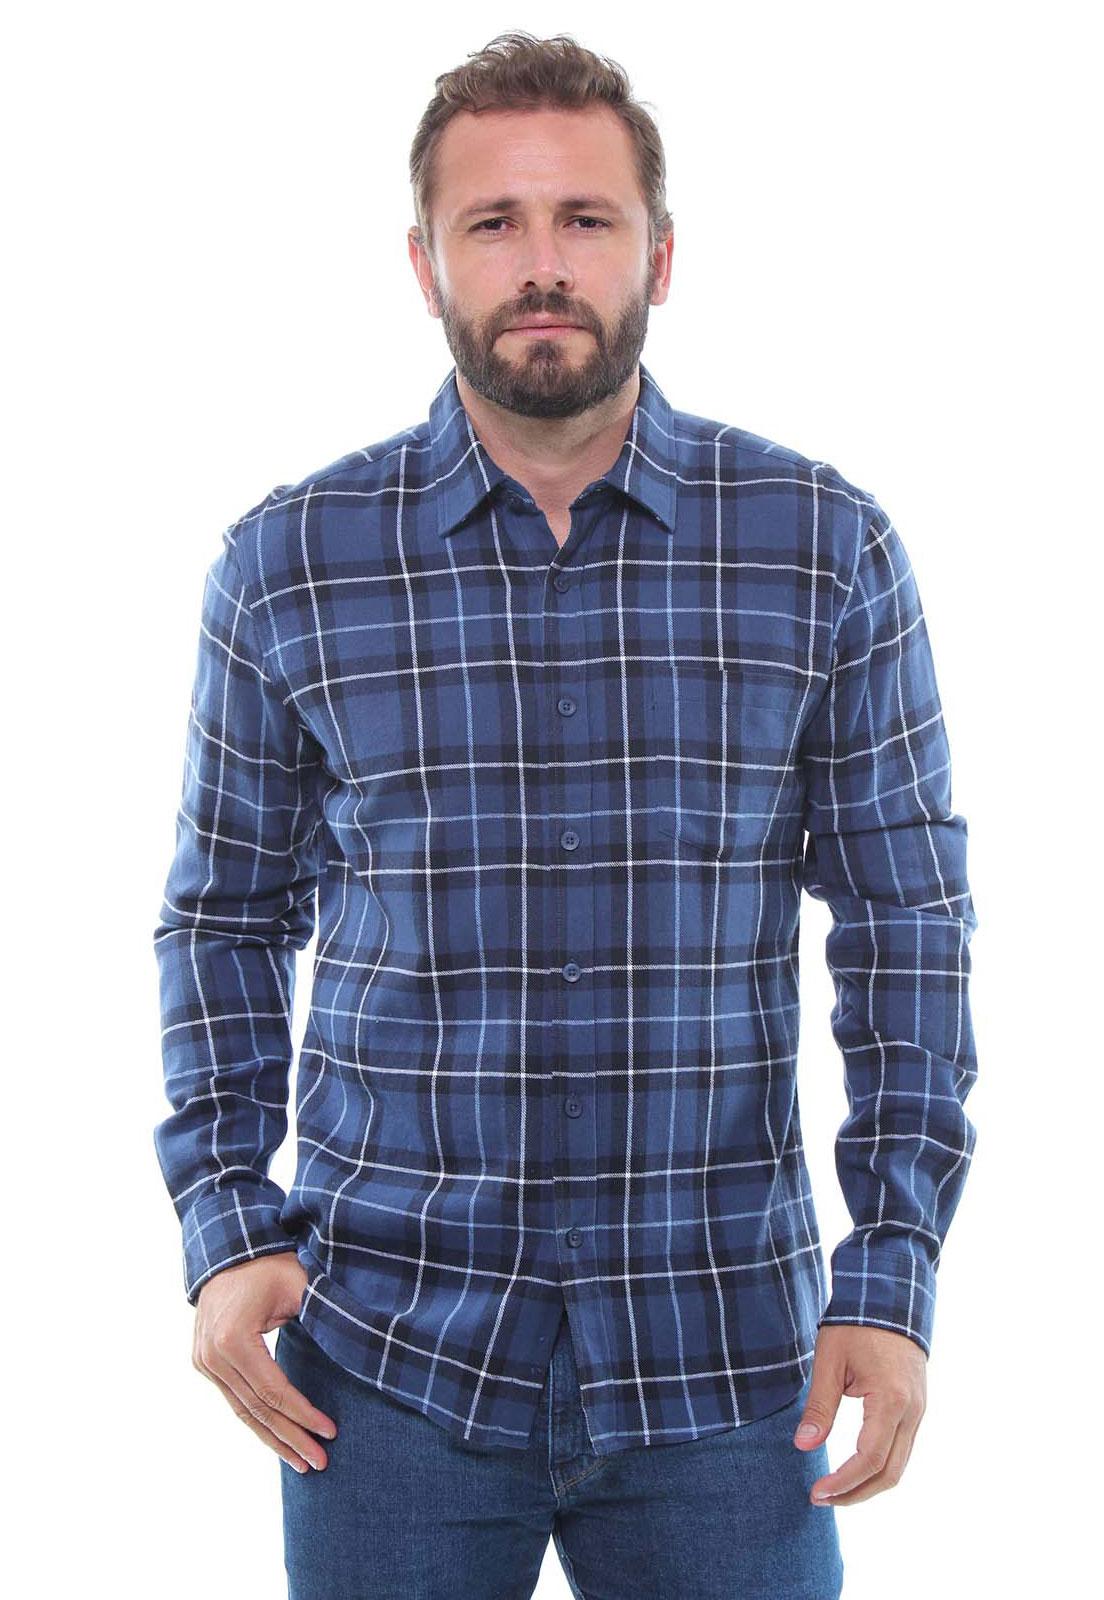 Camisa Xadrez Masculina Flanelada Manga Longa Crocker - 46879  - CROCKER JEANS